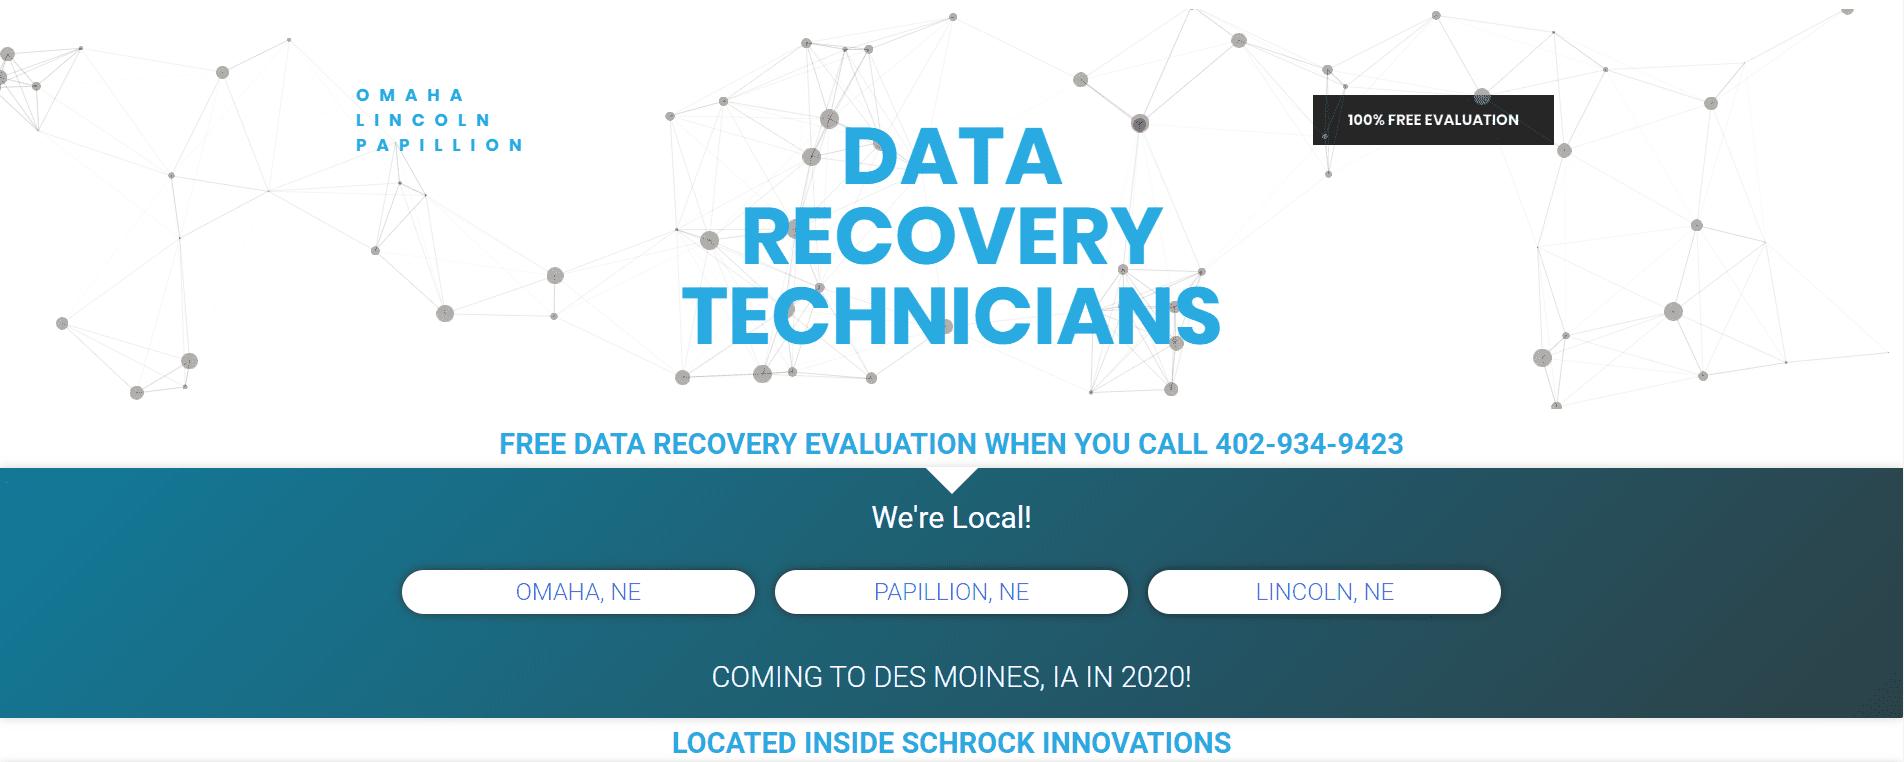 datarecoverytechnicians